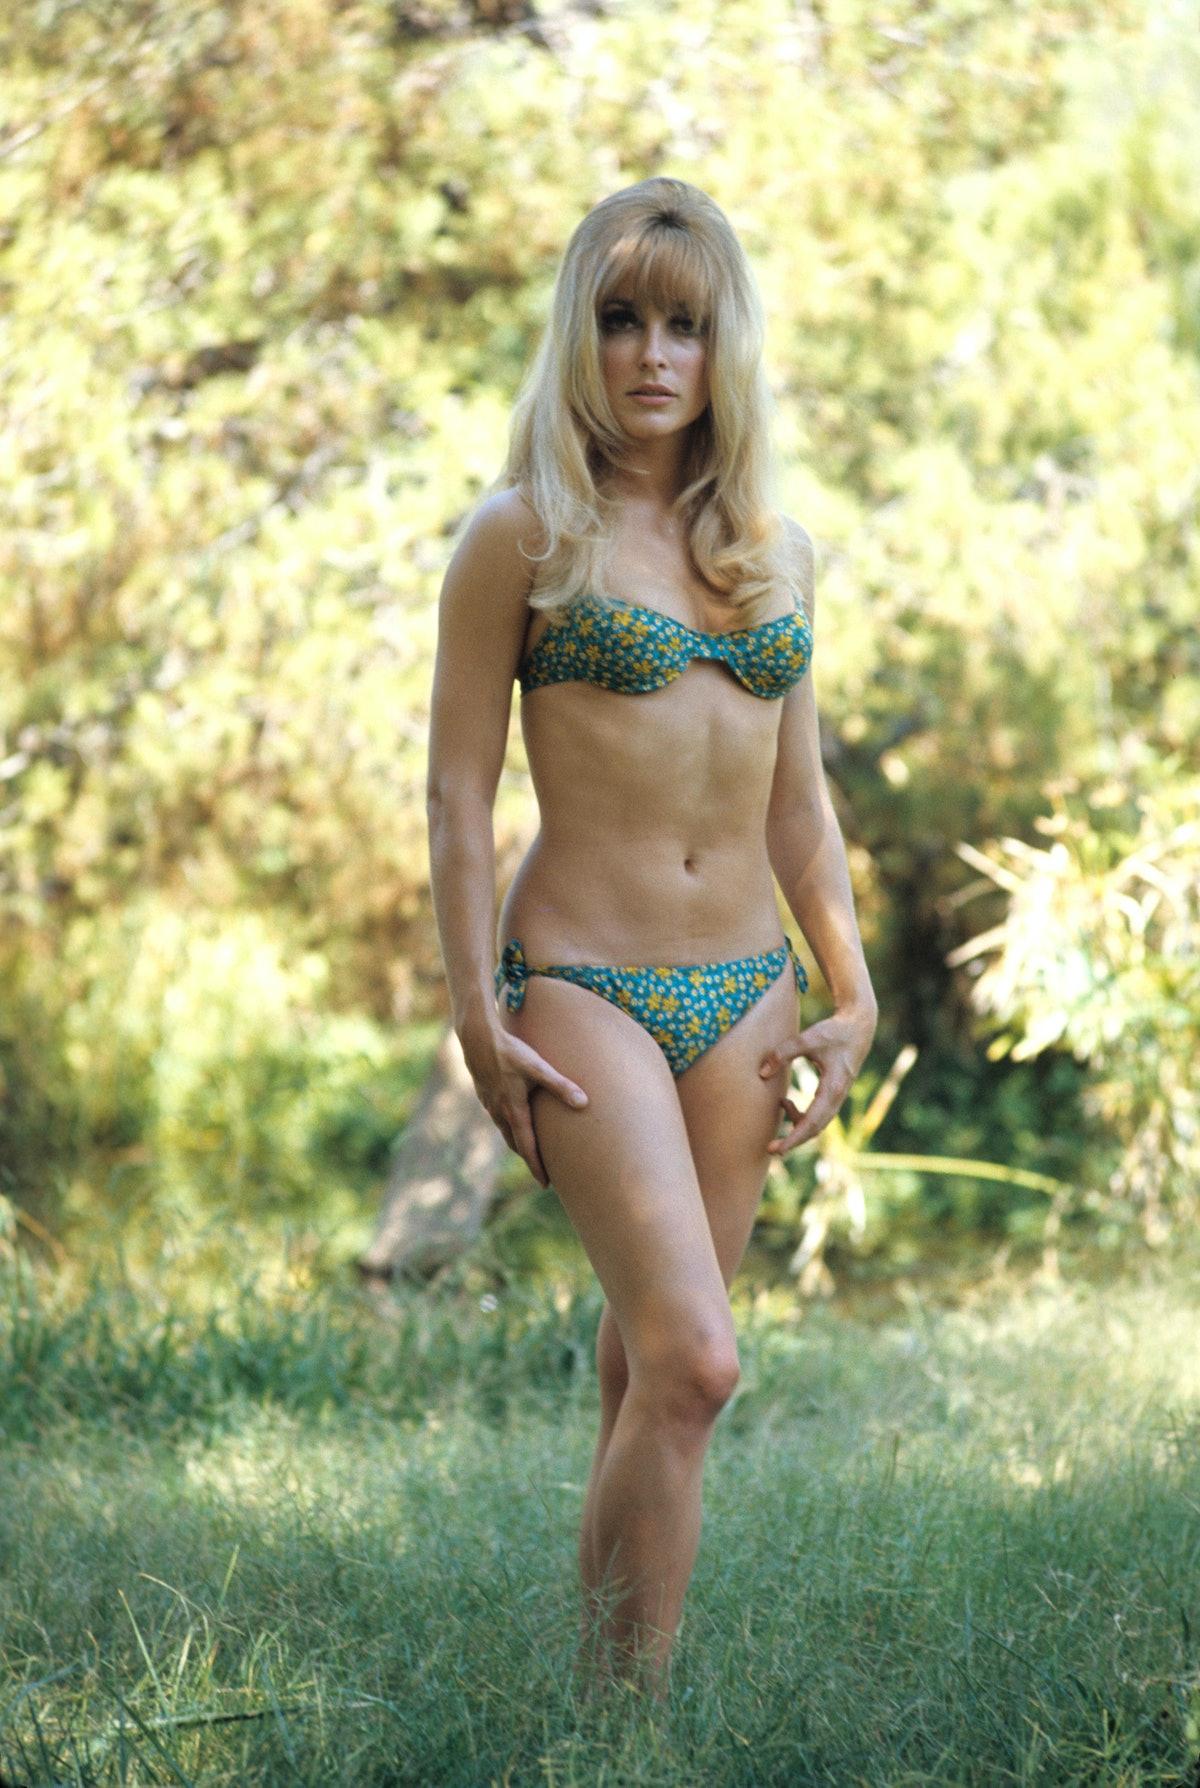 Sharon Tate Bikini